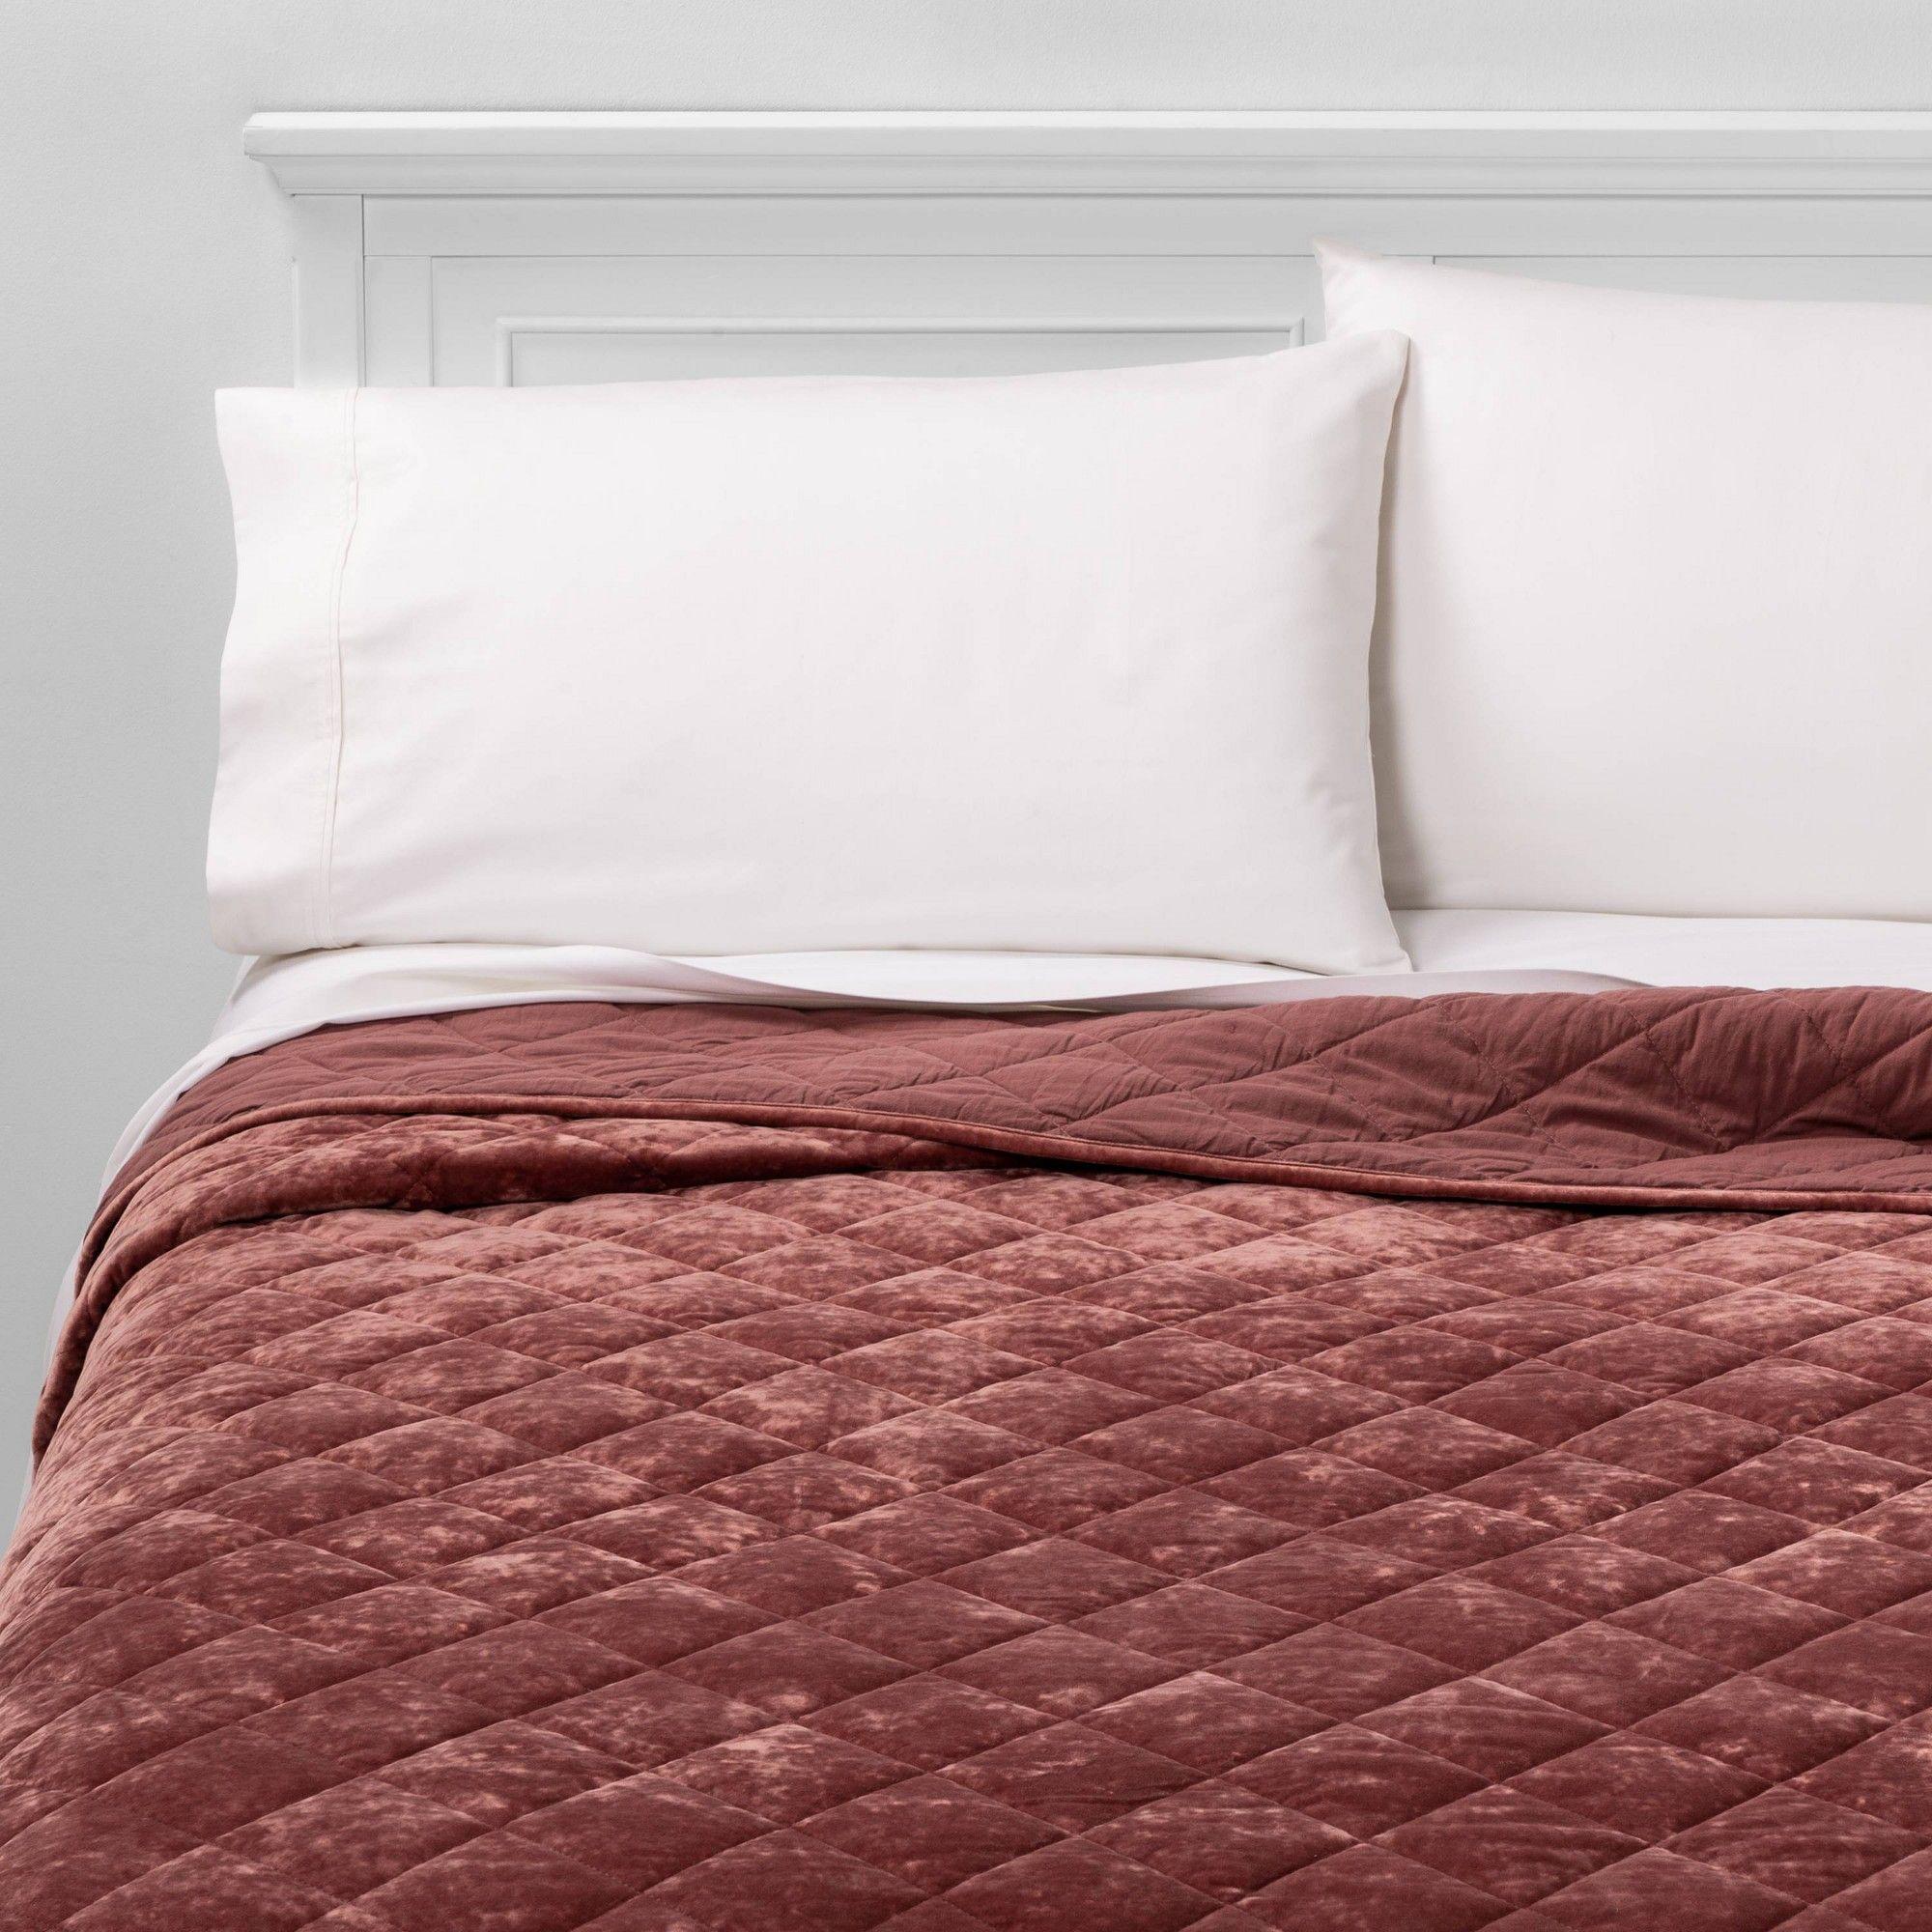 Pin By Felicia Flick On Guest Bedroom In 2020 Velvet Quilt